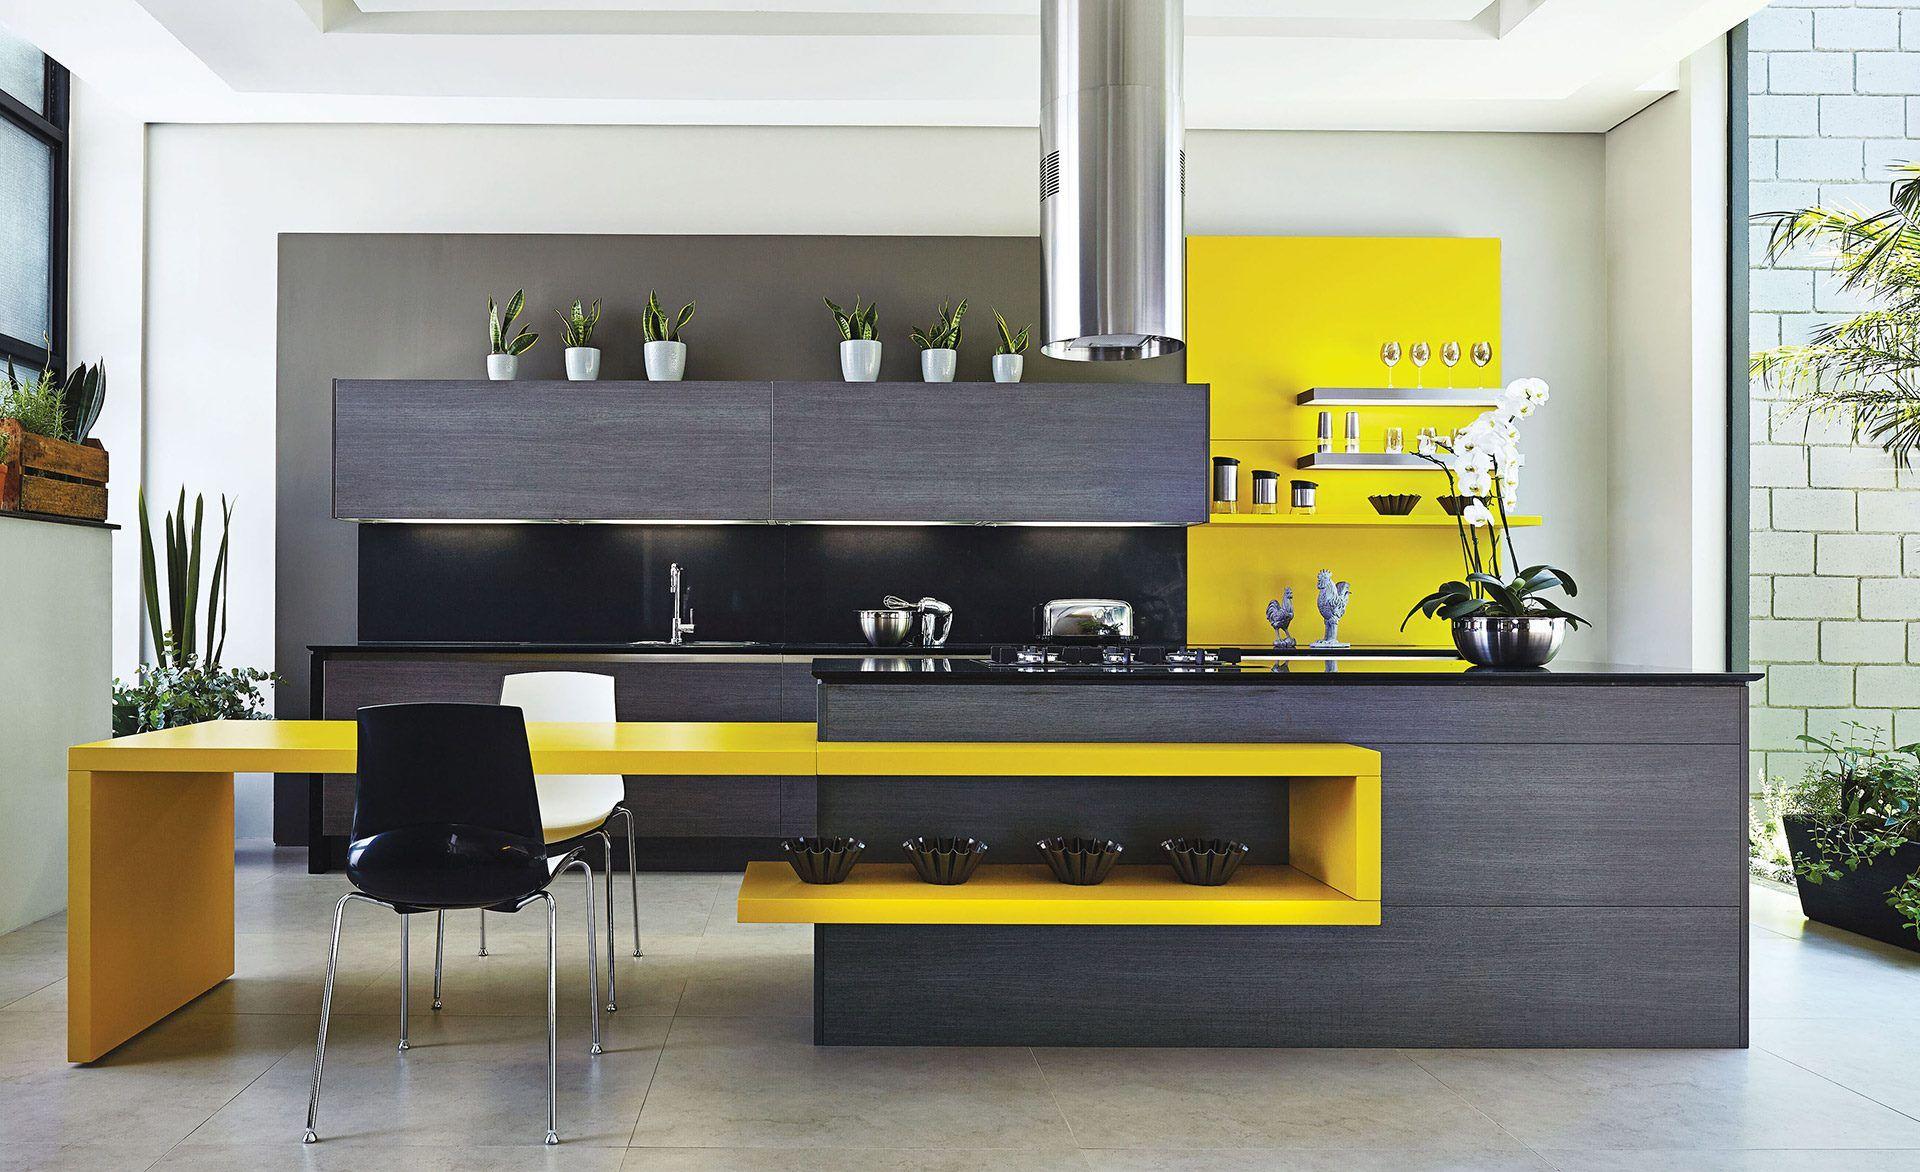 Kitchen - Yellow / Gray | Details | Pinterest